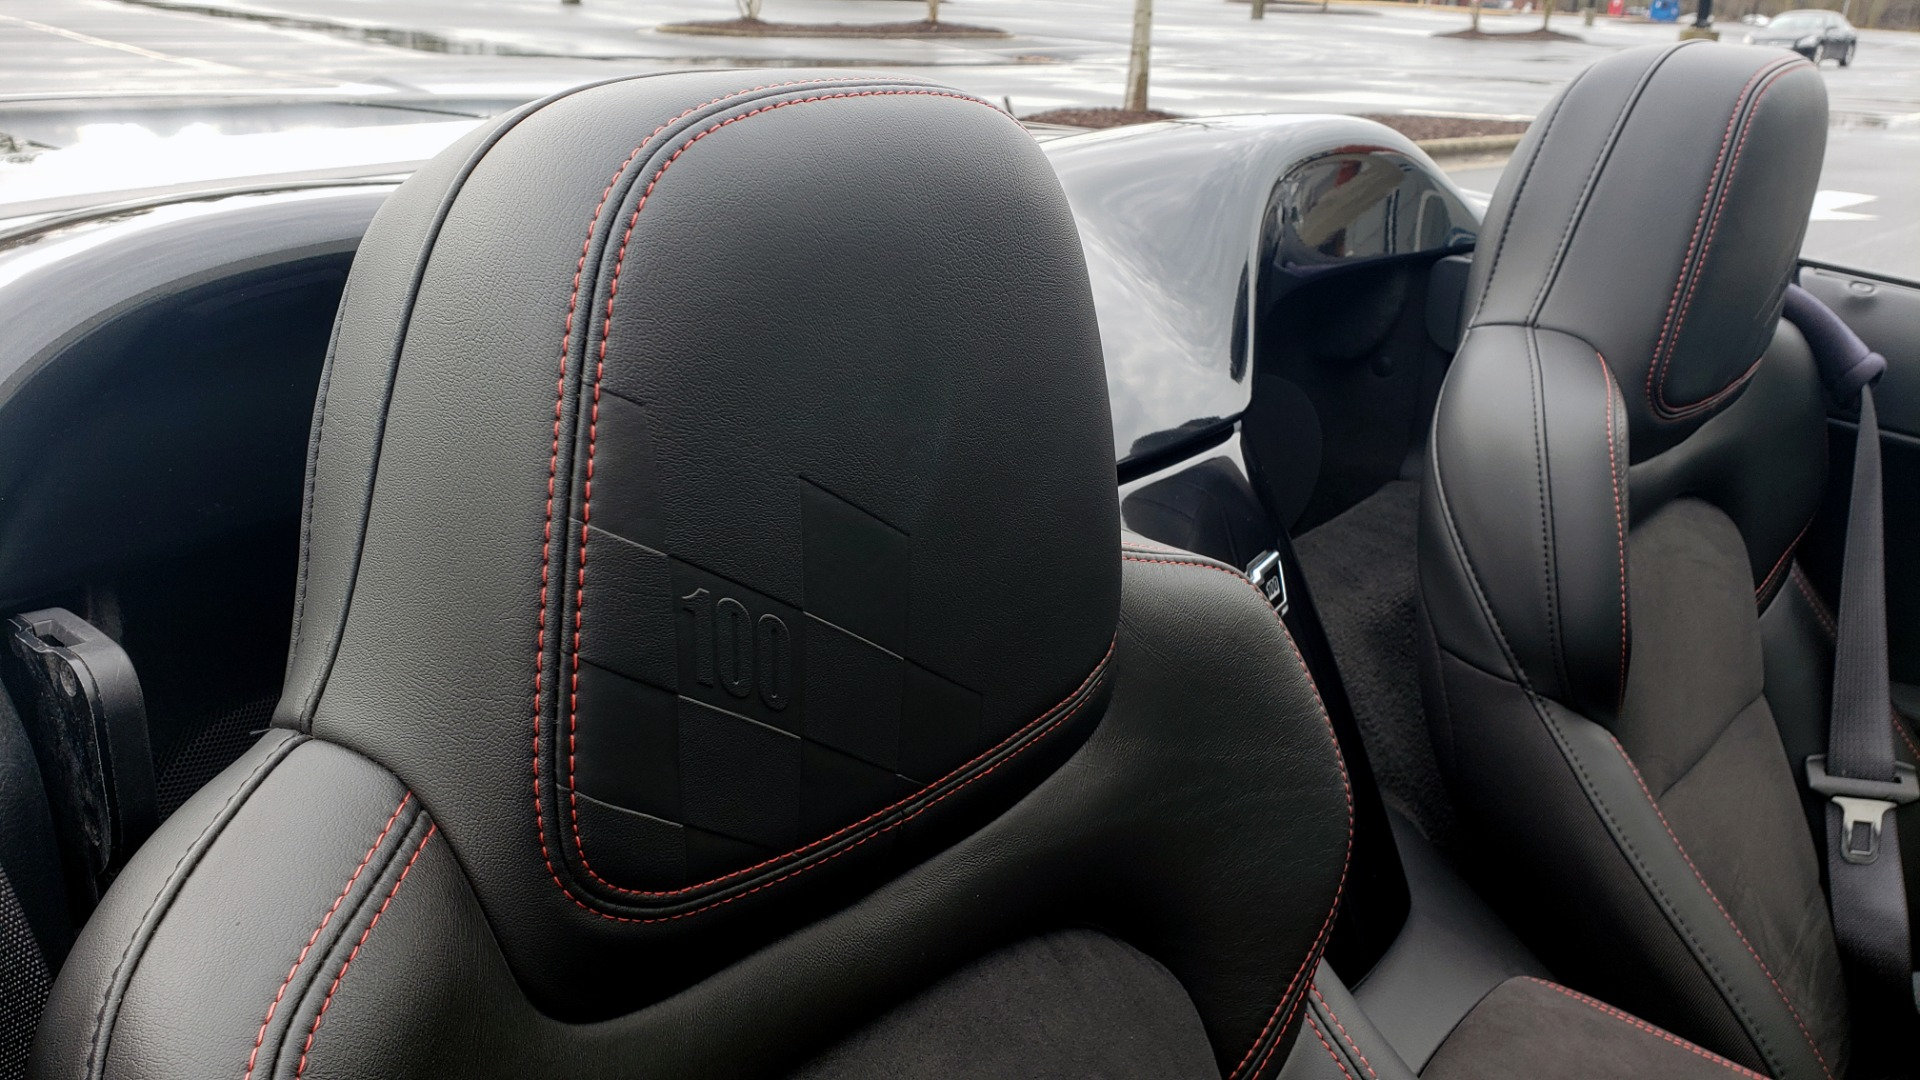 Used 2012 Chevrolet CORVETTE Z16 GRAND SPORT 3LT CONVERTIBLE / 6-SPD AUTO / NAV for sale $38,990 at Formula Imports in Charlotte NC 28227 64